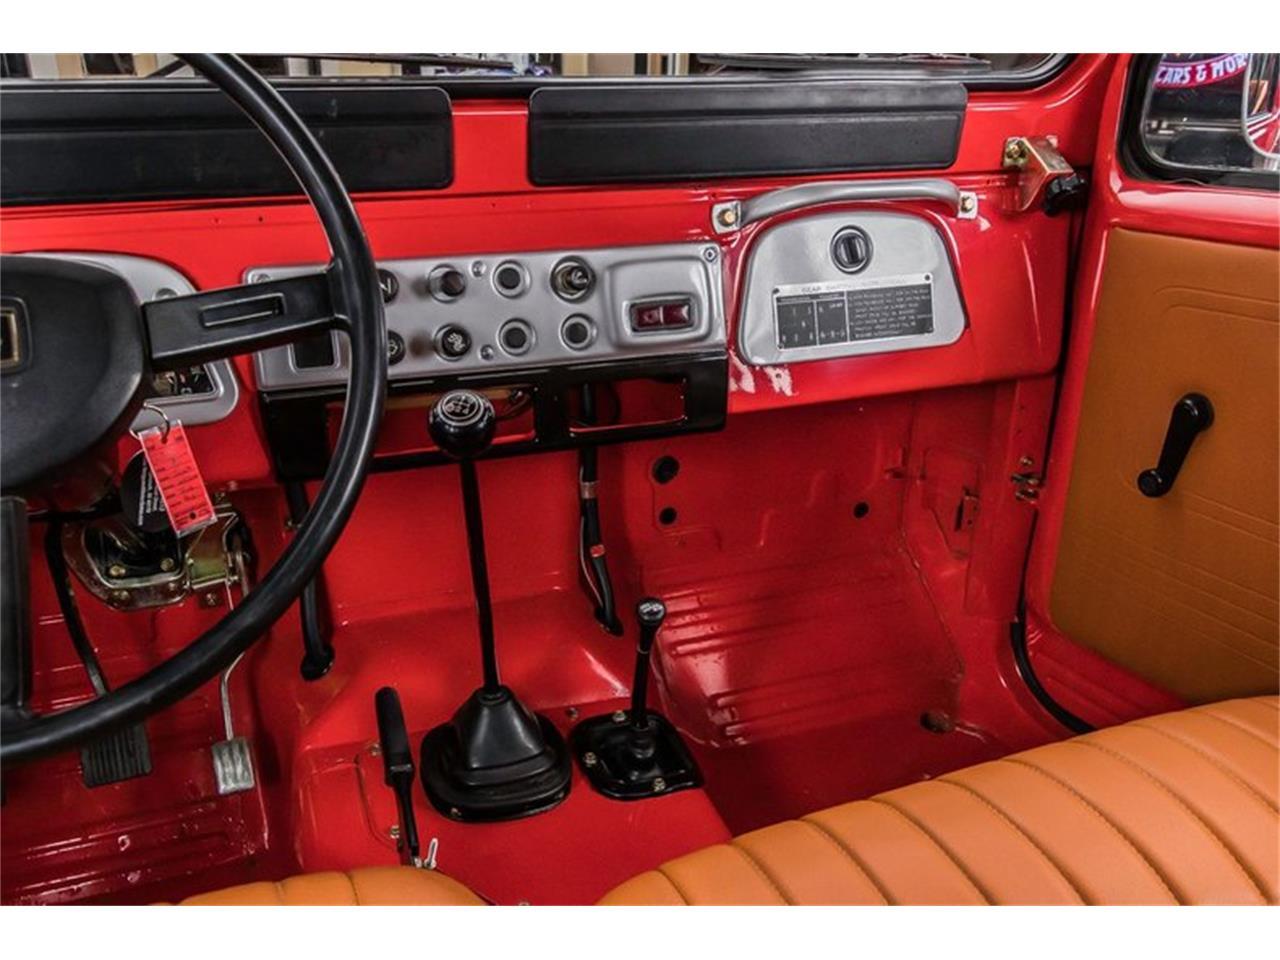 1981 Toyota Land Cruiser FJ (CC-1257091) for sale in Plymouth, Michigan